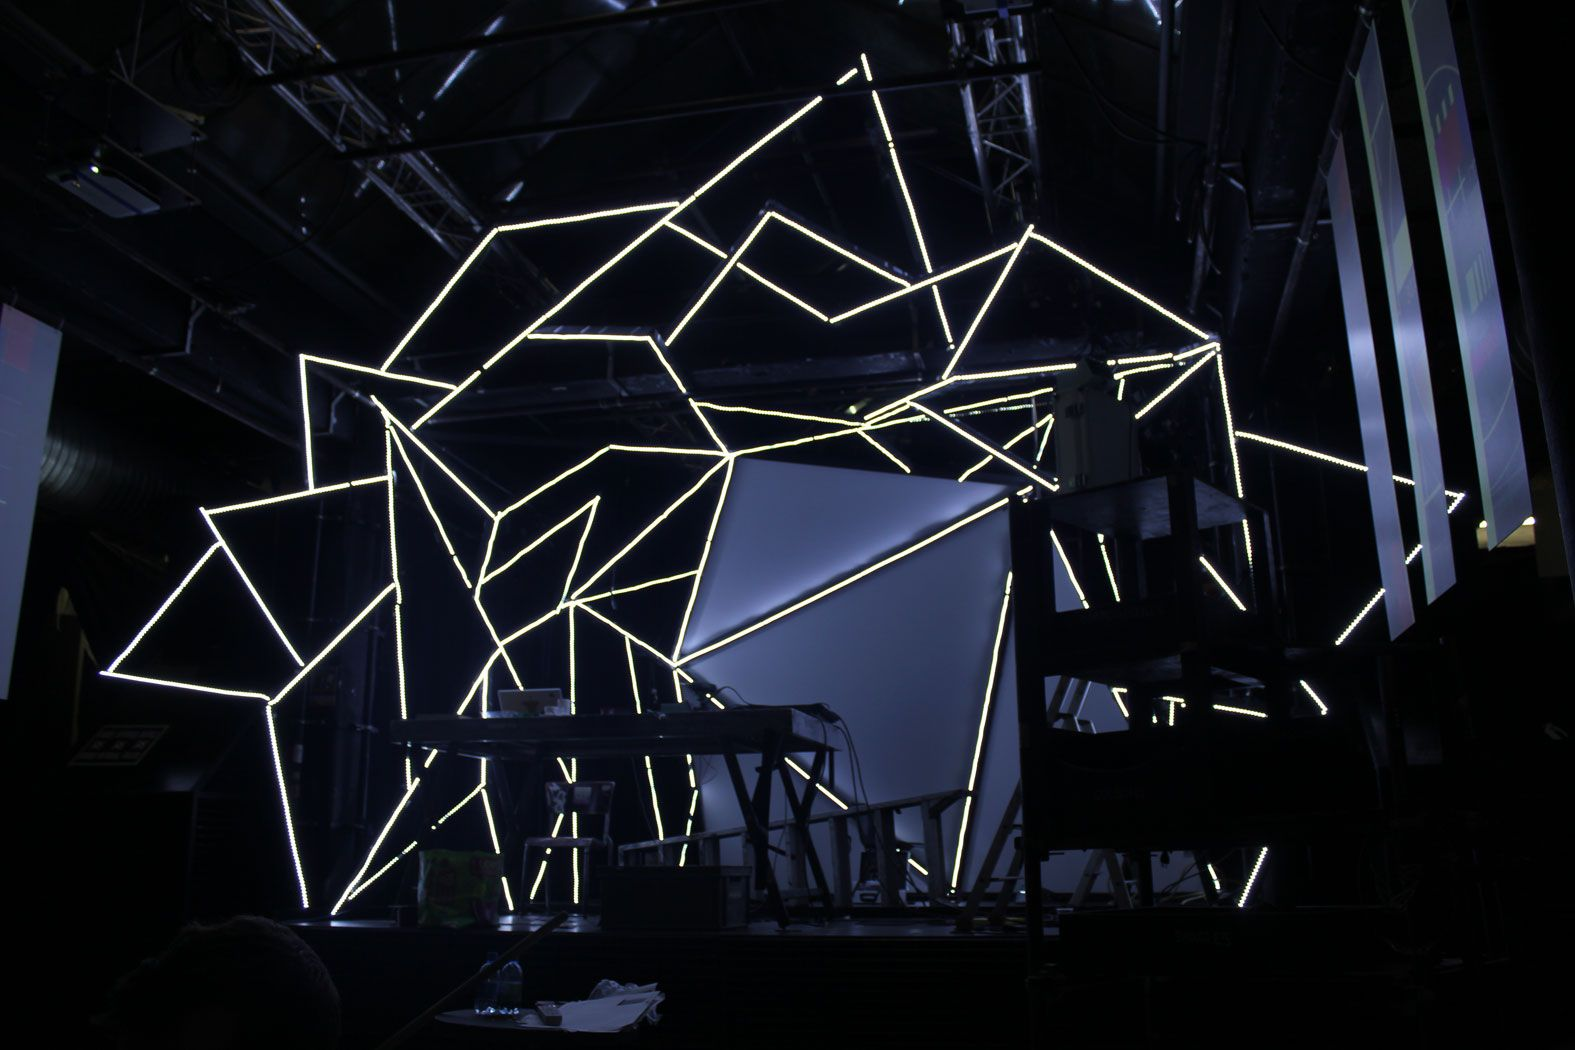 Controlling Led Strips from Madmapper | Art, Installation ... for Led Light Installation Art  588gtk